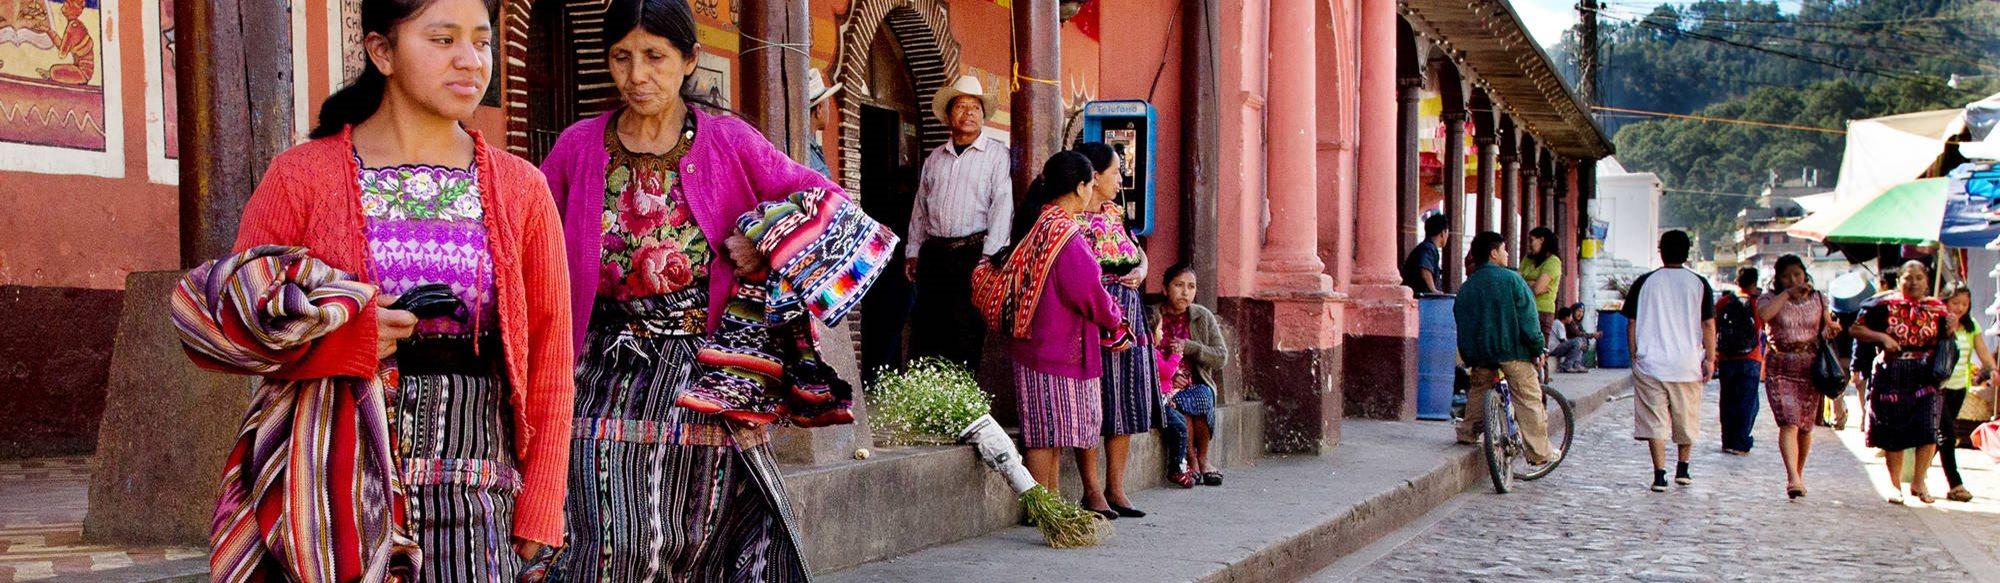 Dating kultur i guatemala